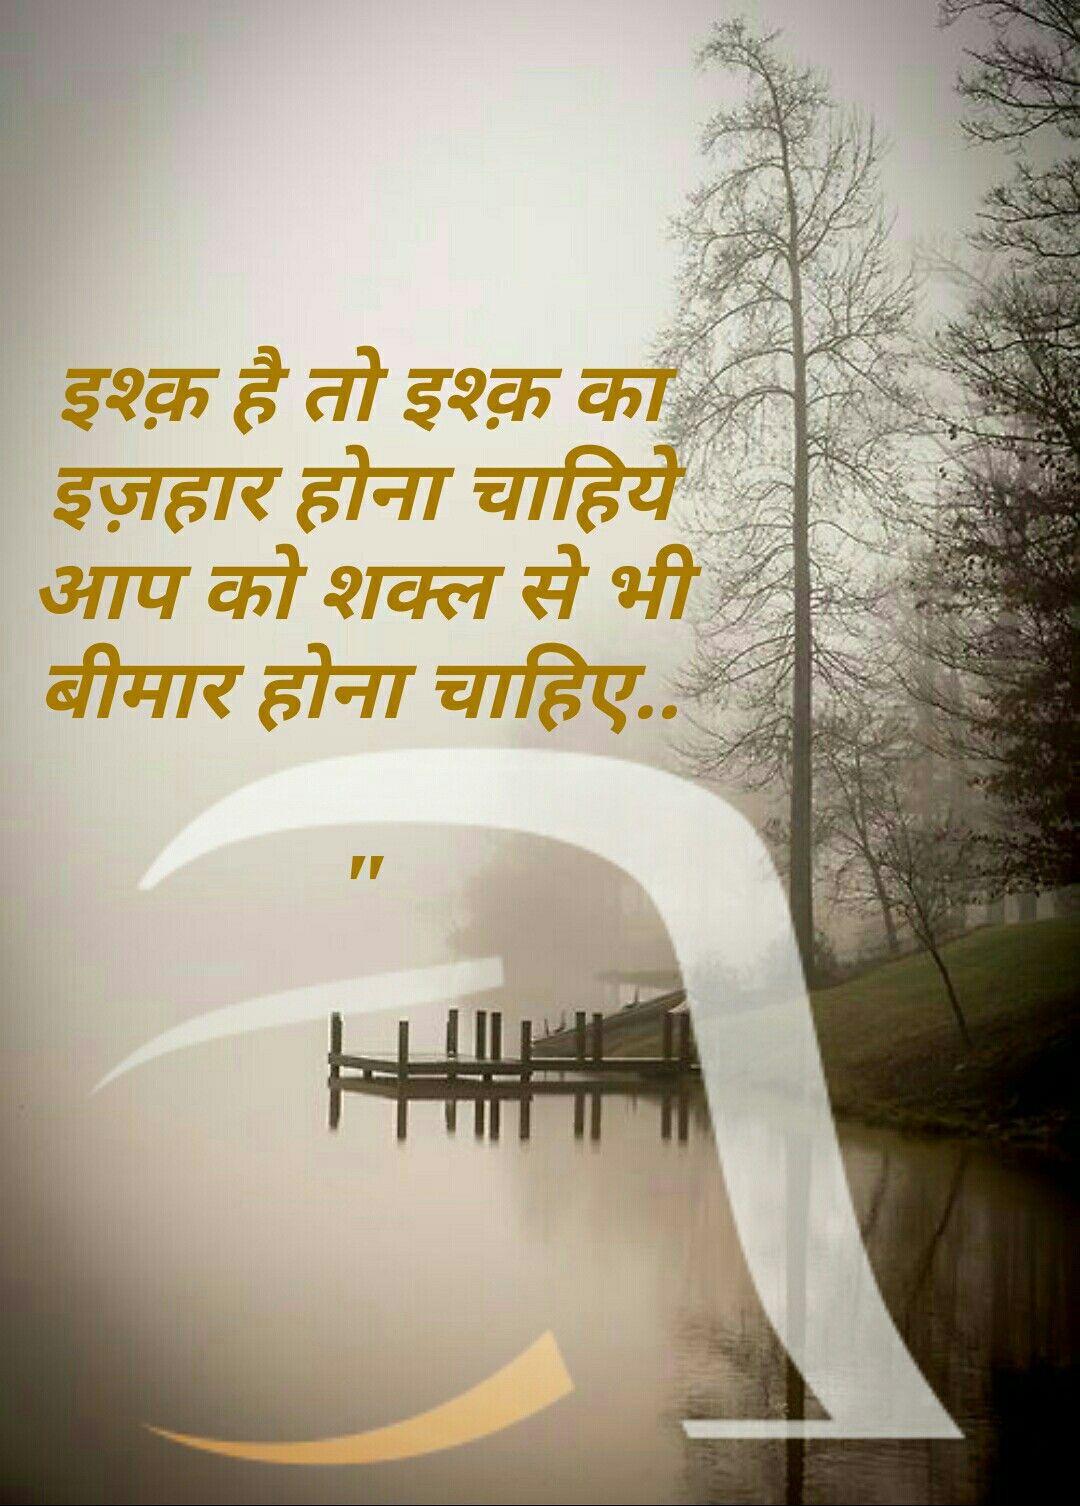 Pin By Meri Awaargi On À¤¹ À¤¨ À¤¦ À¤¤à¤°à¤•à¤¶ Hindi Tarkash Bones Funny Innocent Love Truth